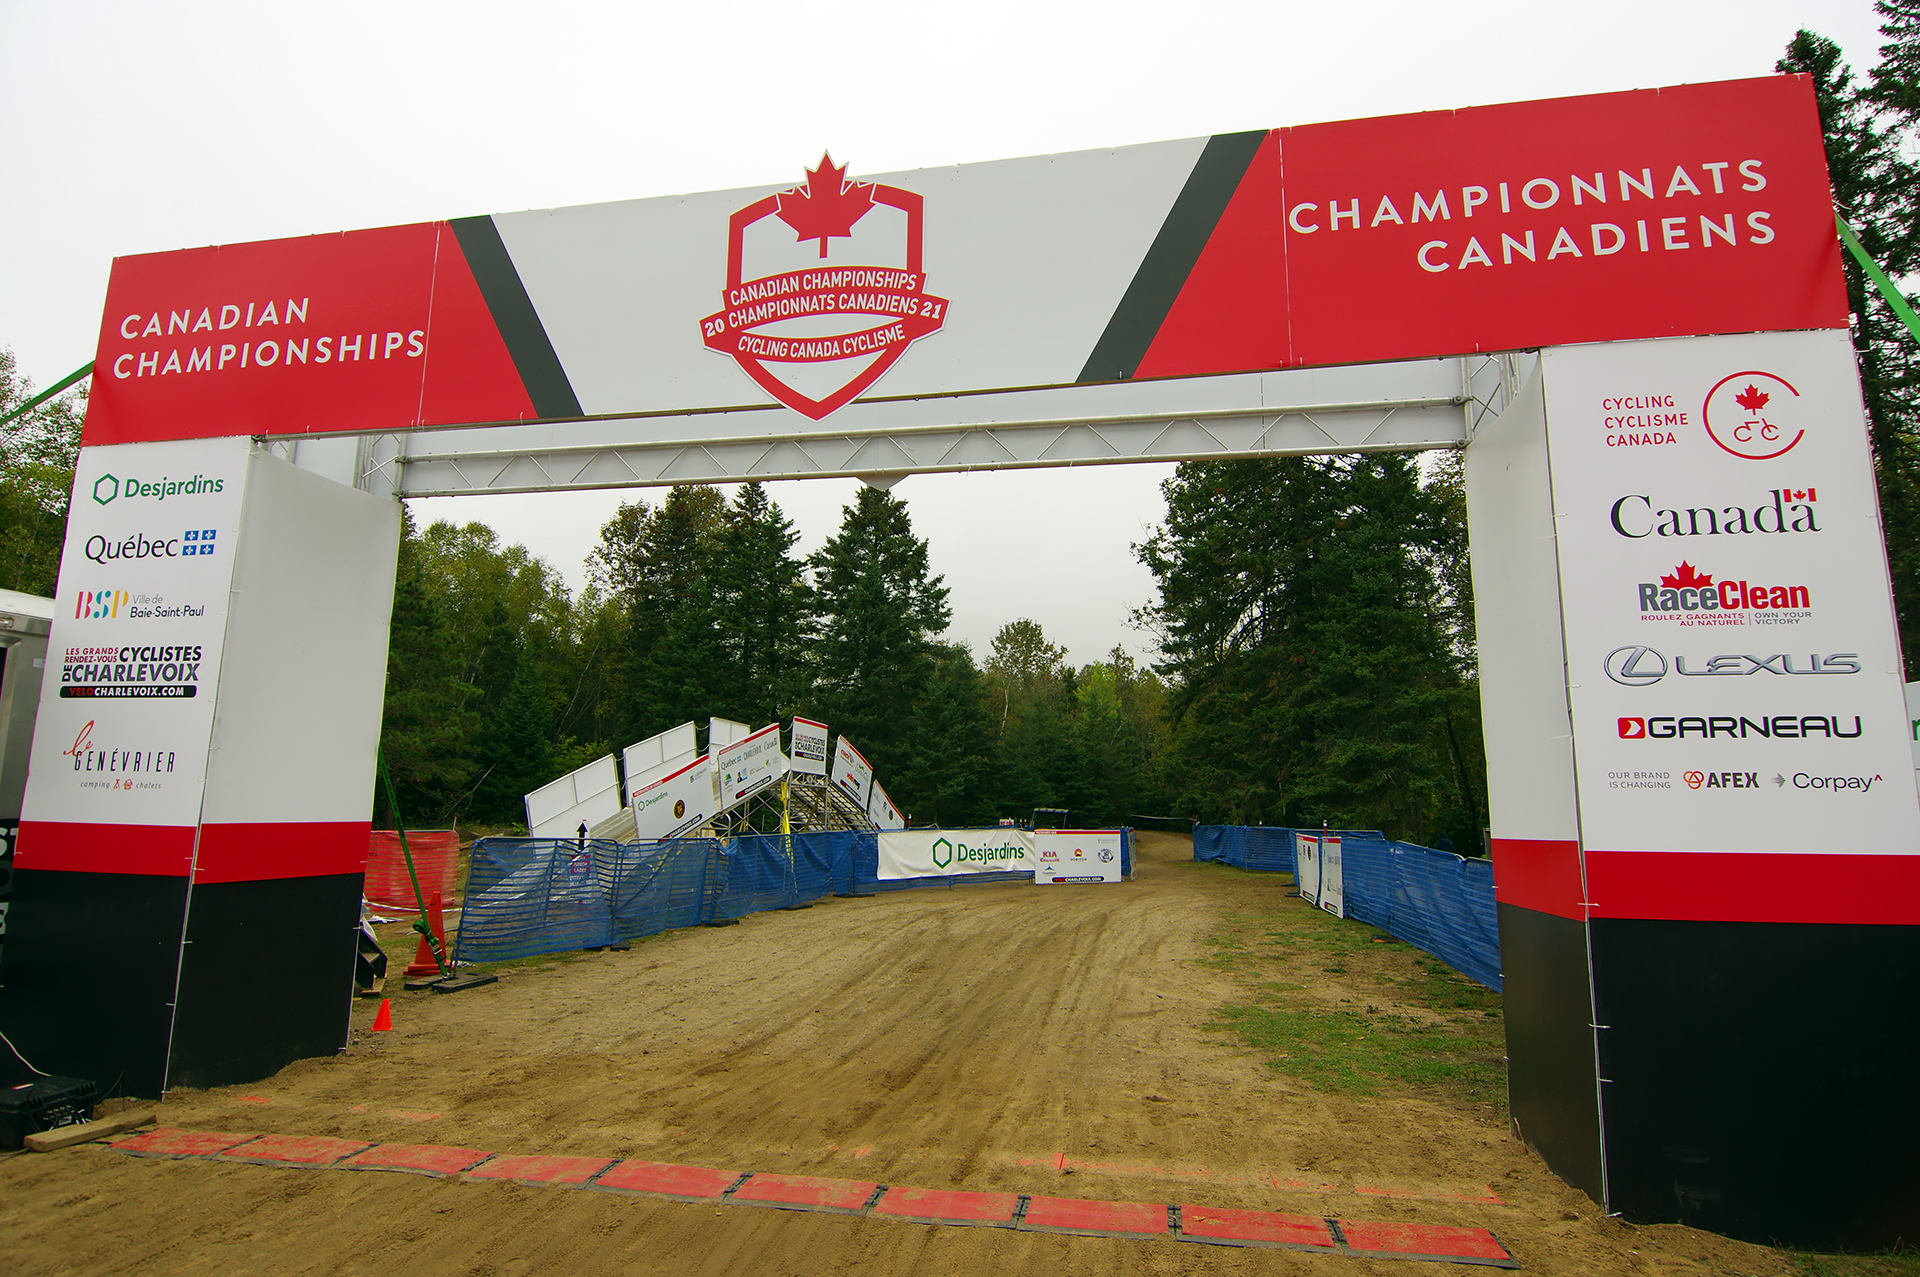 Championnats canadiens XCO-XCC_Final QC 2021_20